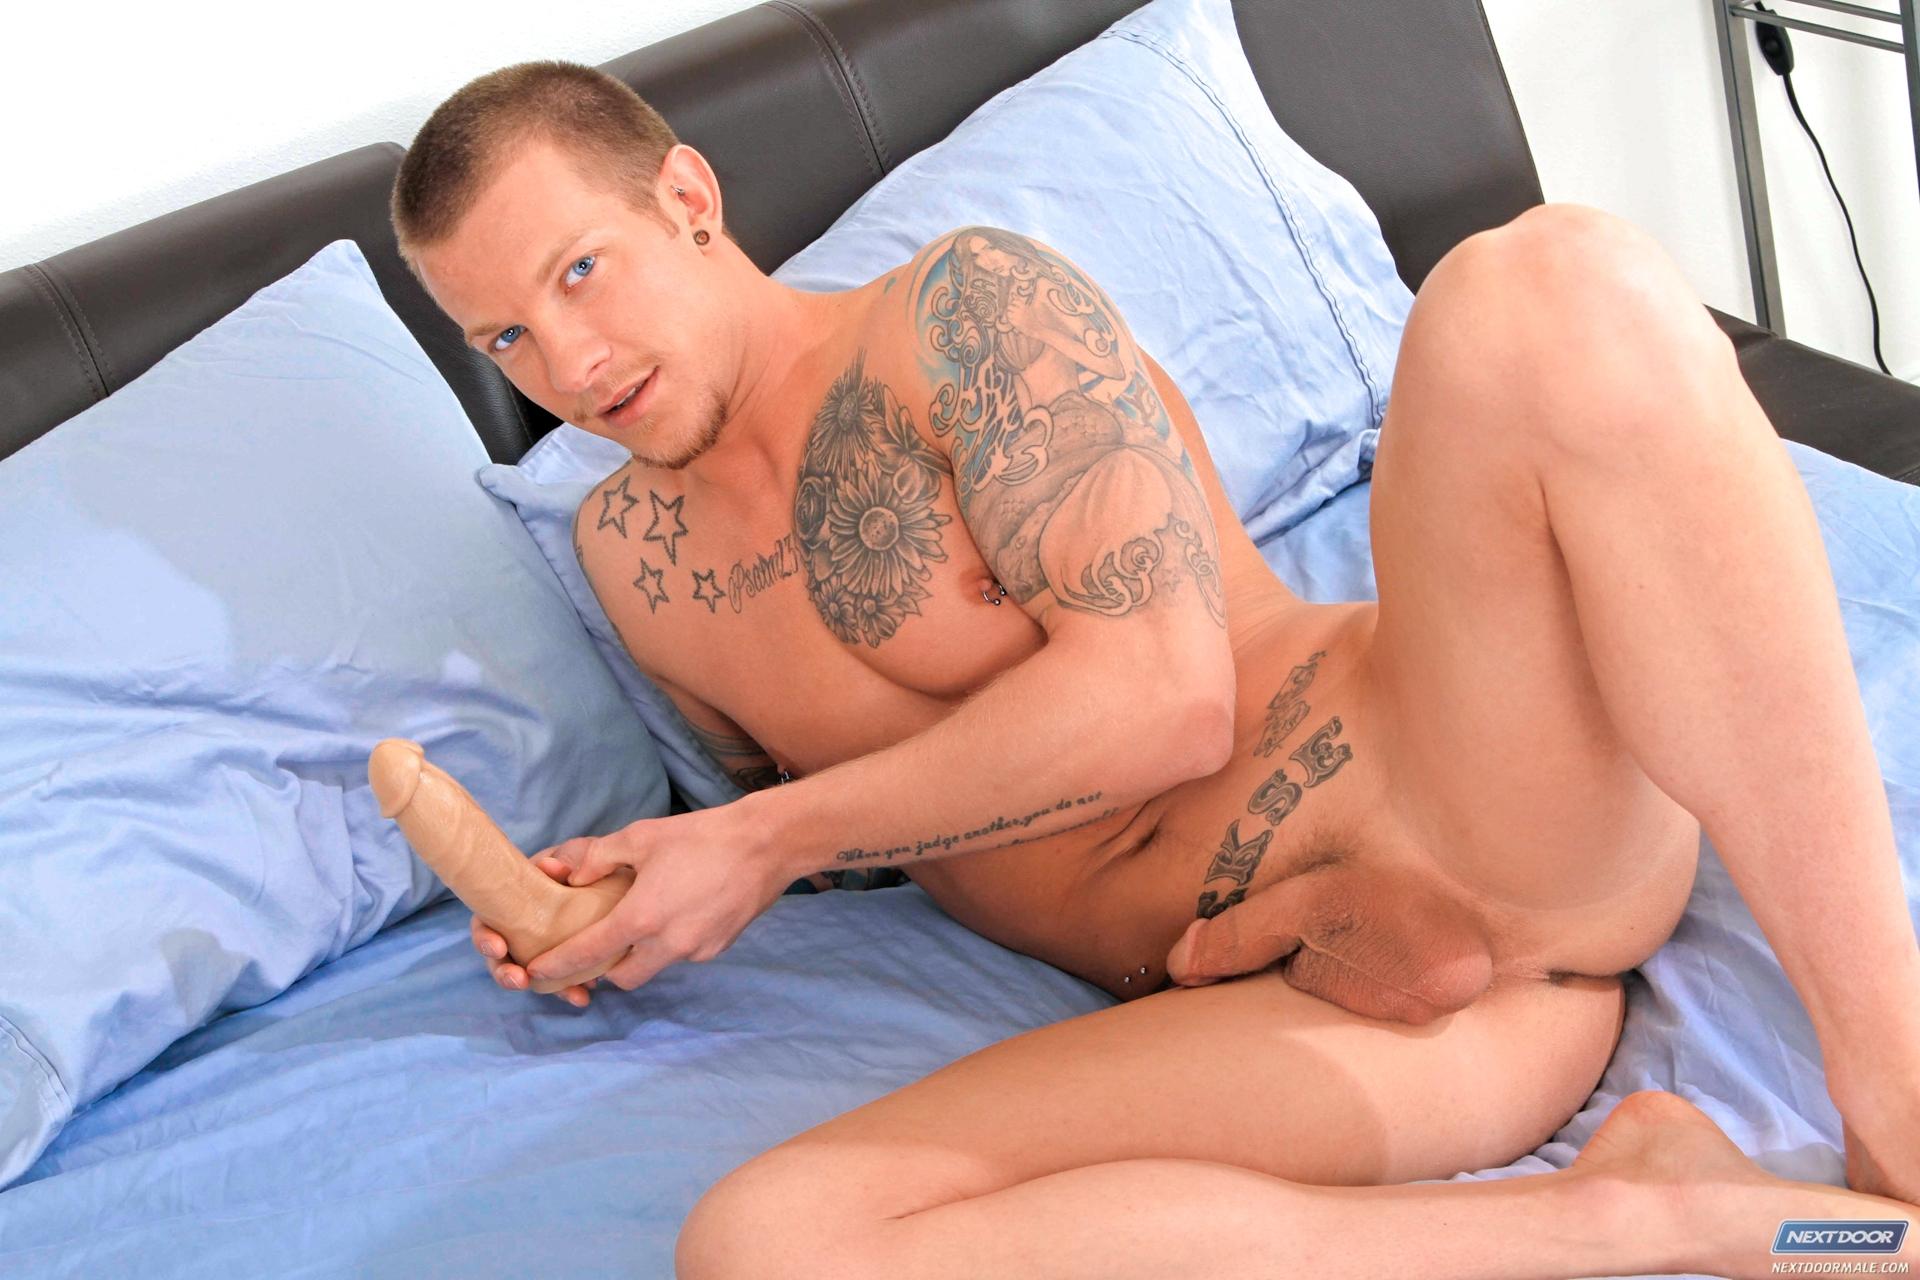 Jaxon colt gay porn star